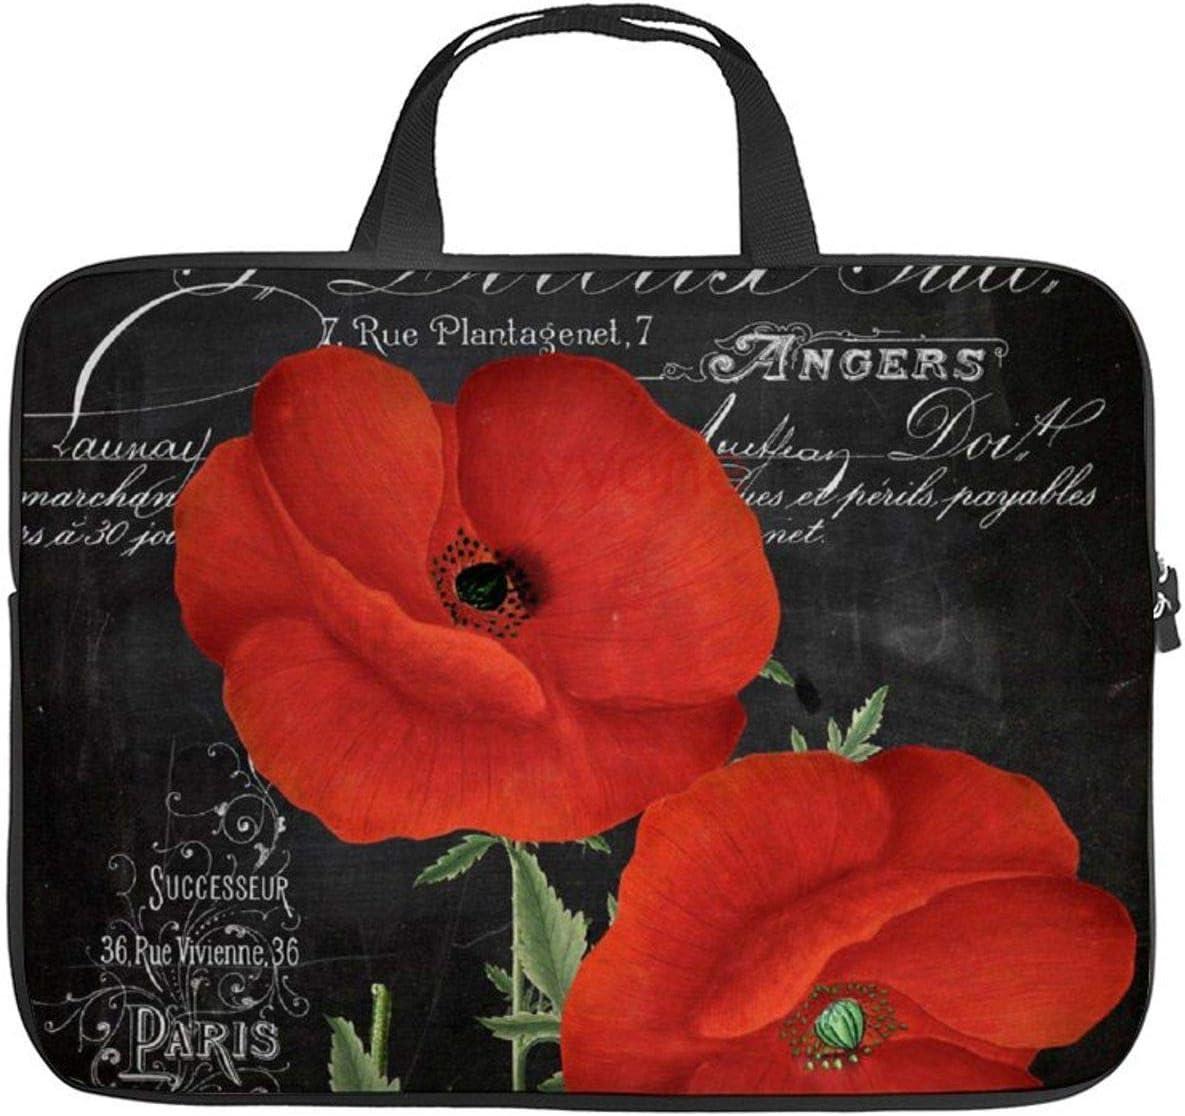 "Neoprene Sleeve Laptop Handbag Case Cover Fleur Du Jour Poppy 10 Inch Laptop Sleeve Case for 9.7"" 10.5"" Ipad Pro Air/ 10"" Microsoft Surface Go/ 10.5"" Samsung Galaxy Tab"